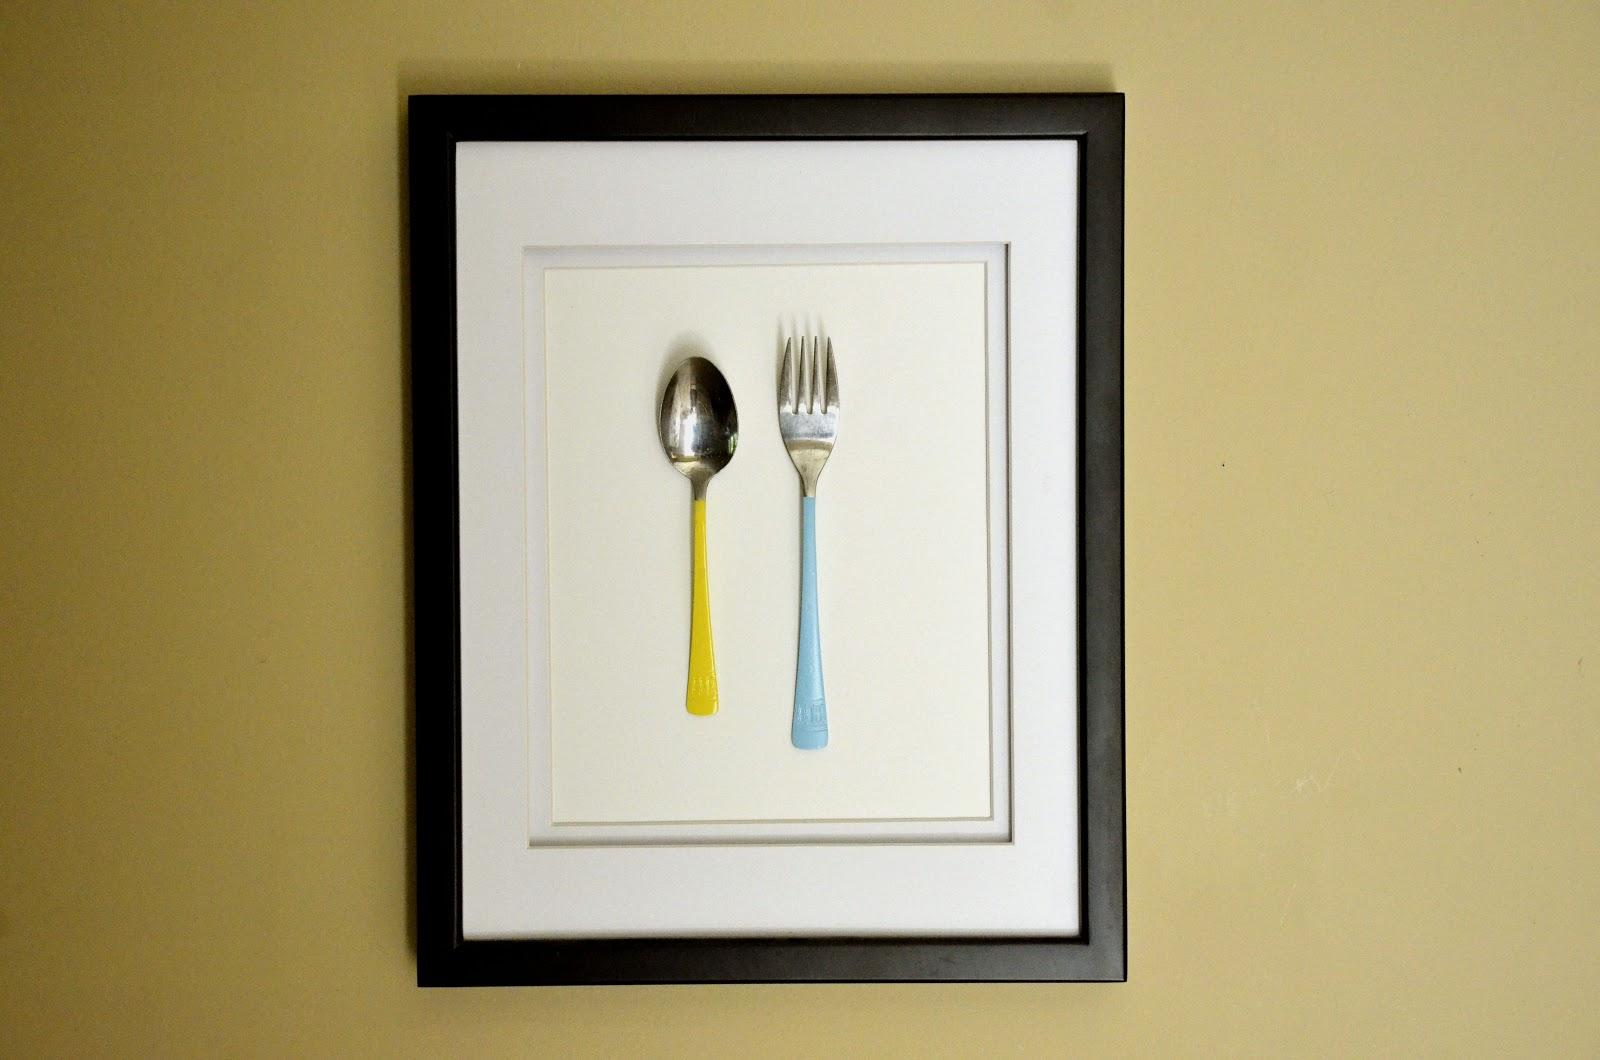 Colored Silverware   Framed Kitchen Art